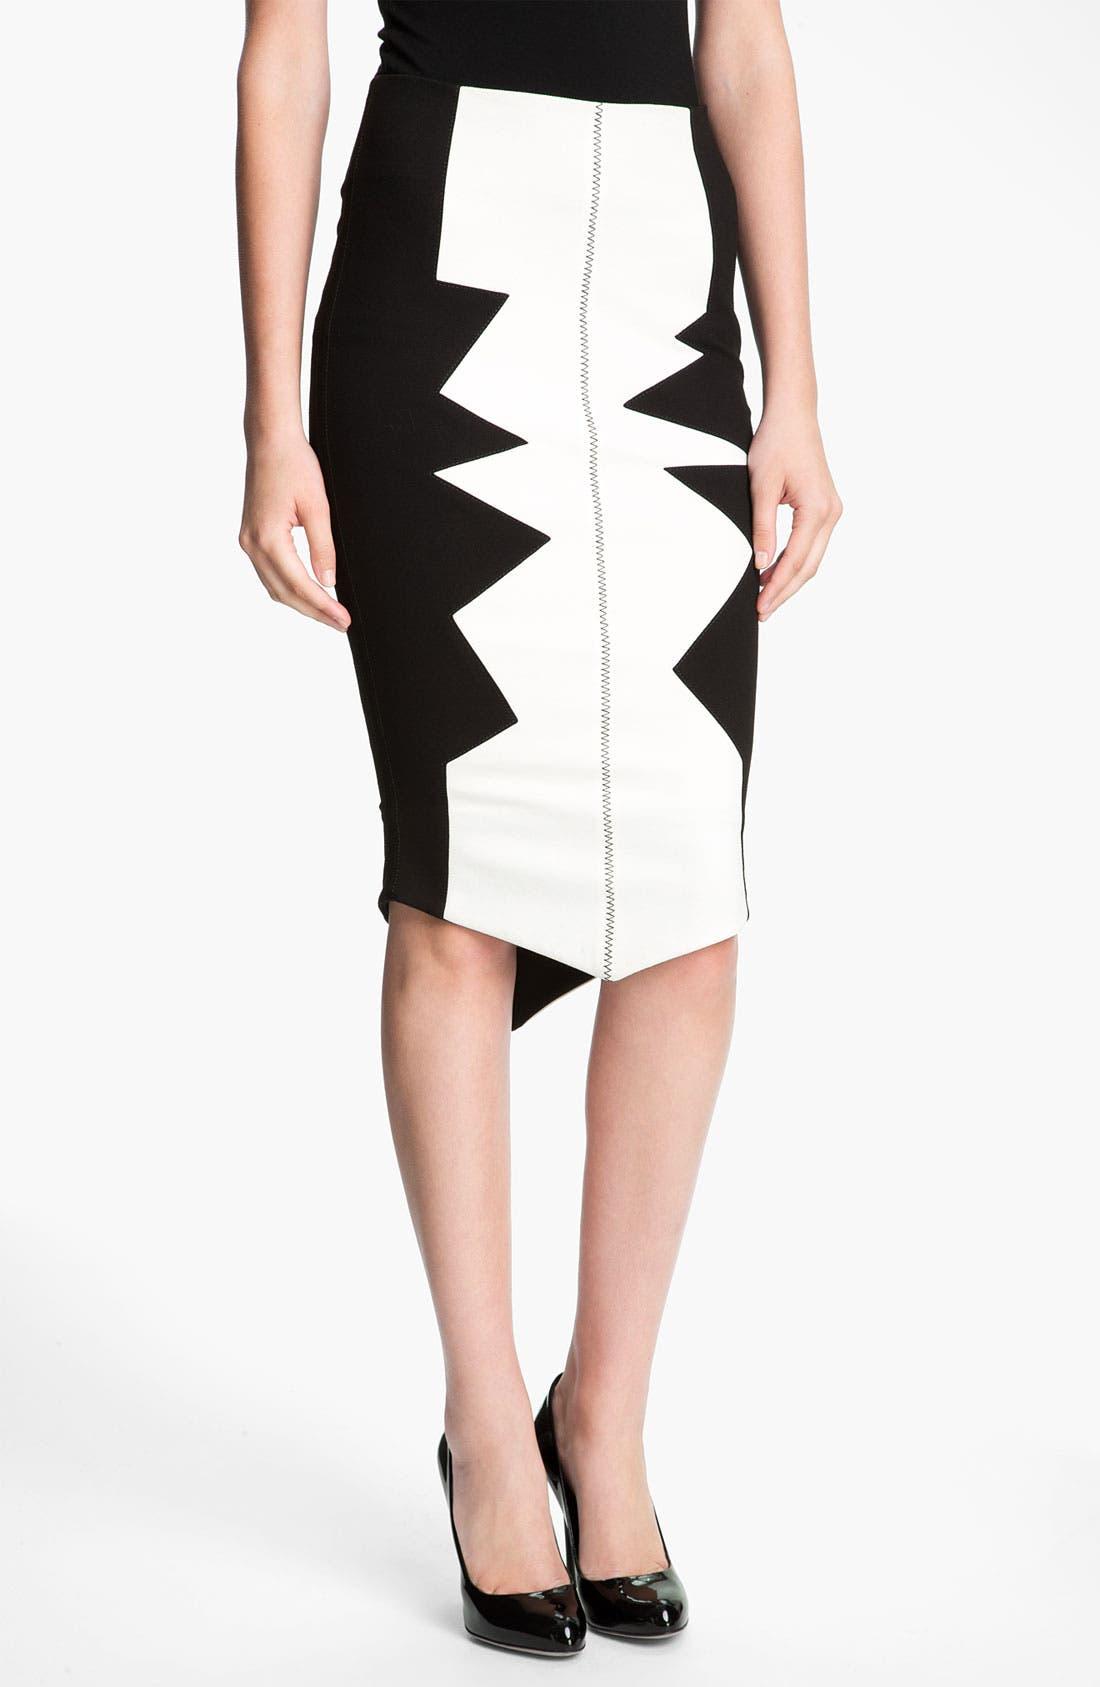 Alternate Image 1 Selected - Kelly Wearstler 'Organto' Contrast Panel Knit Pencil Skirt